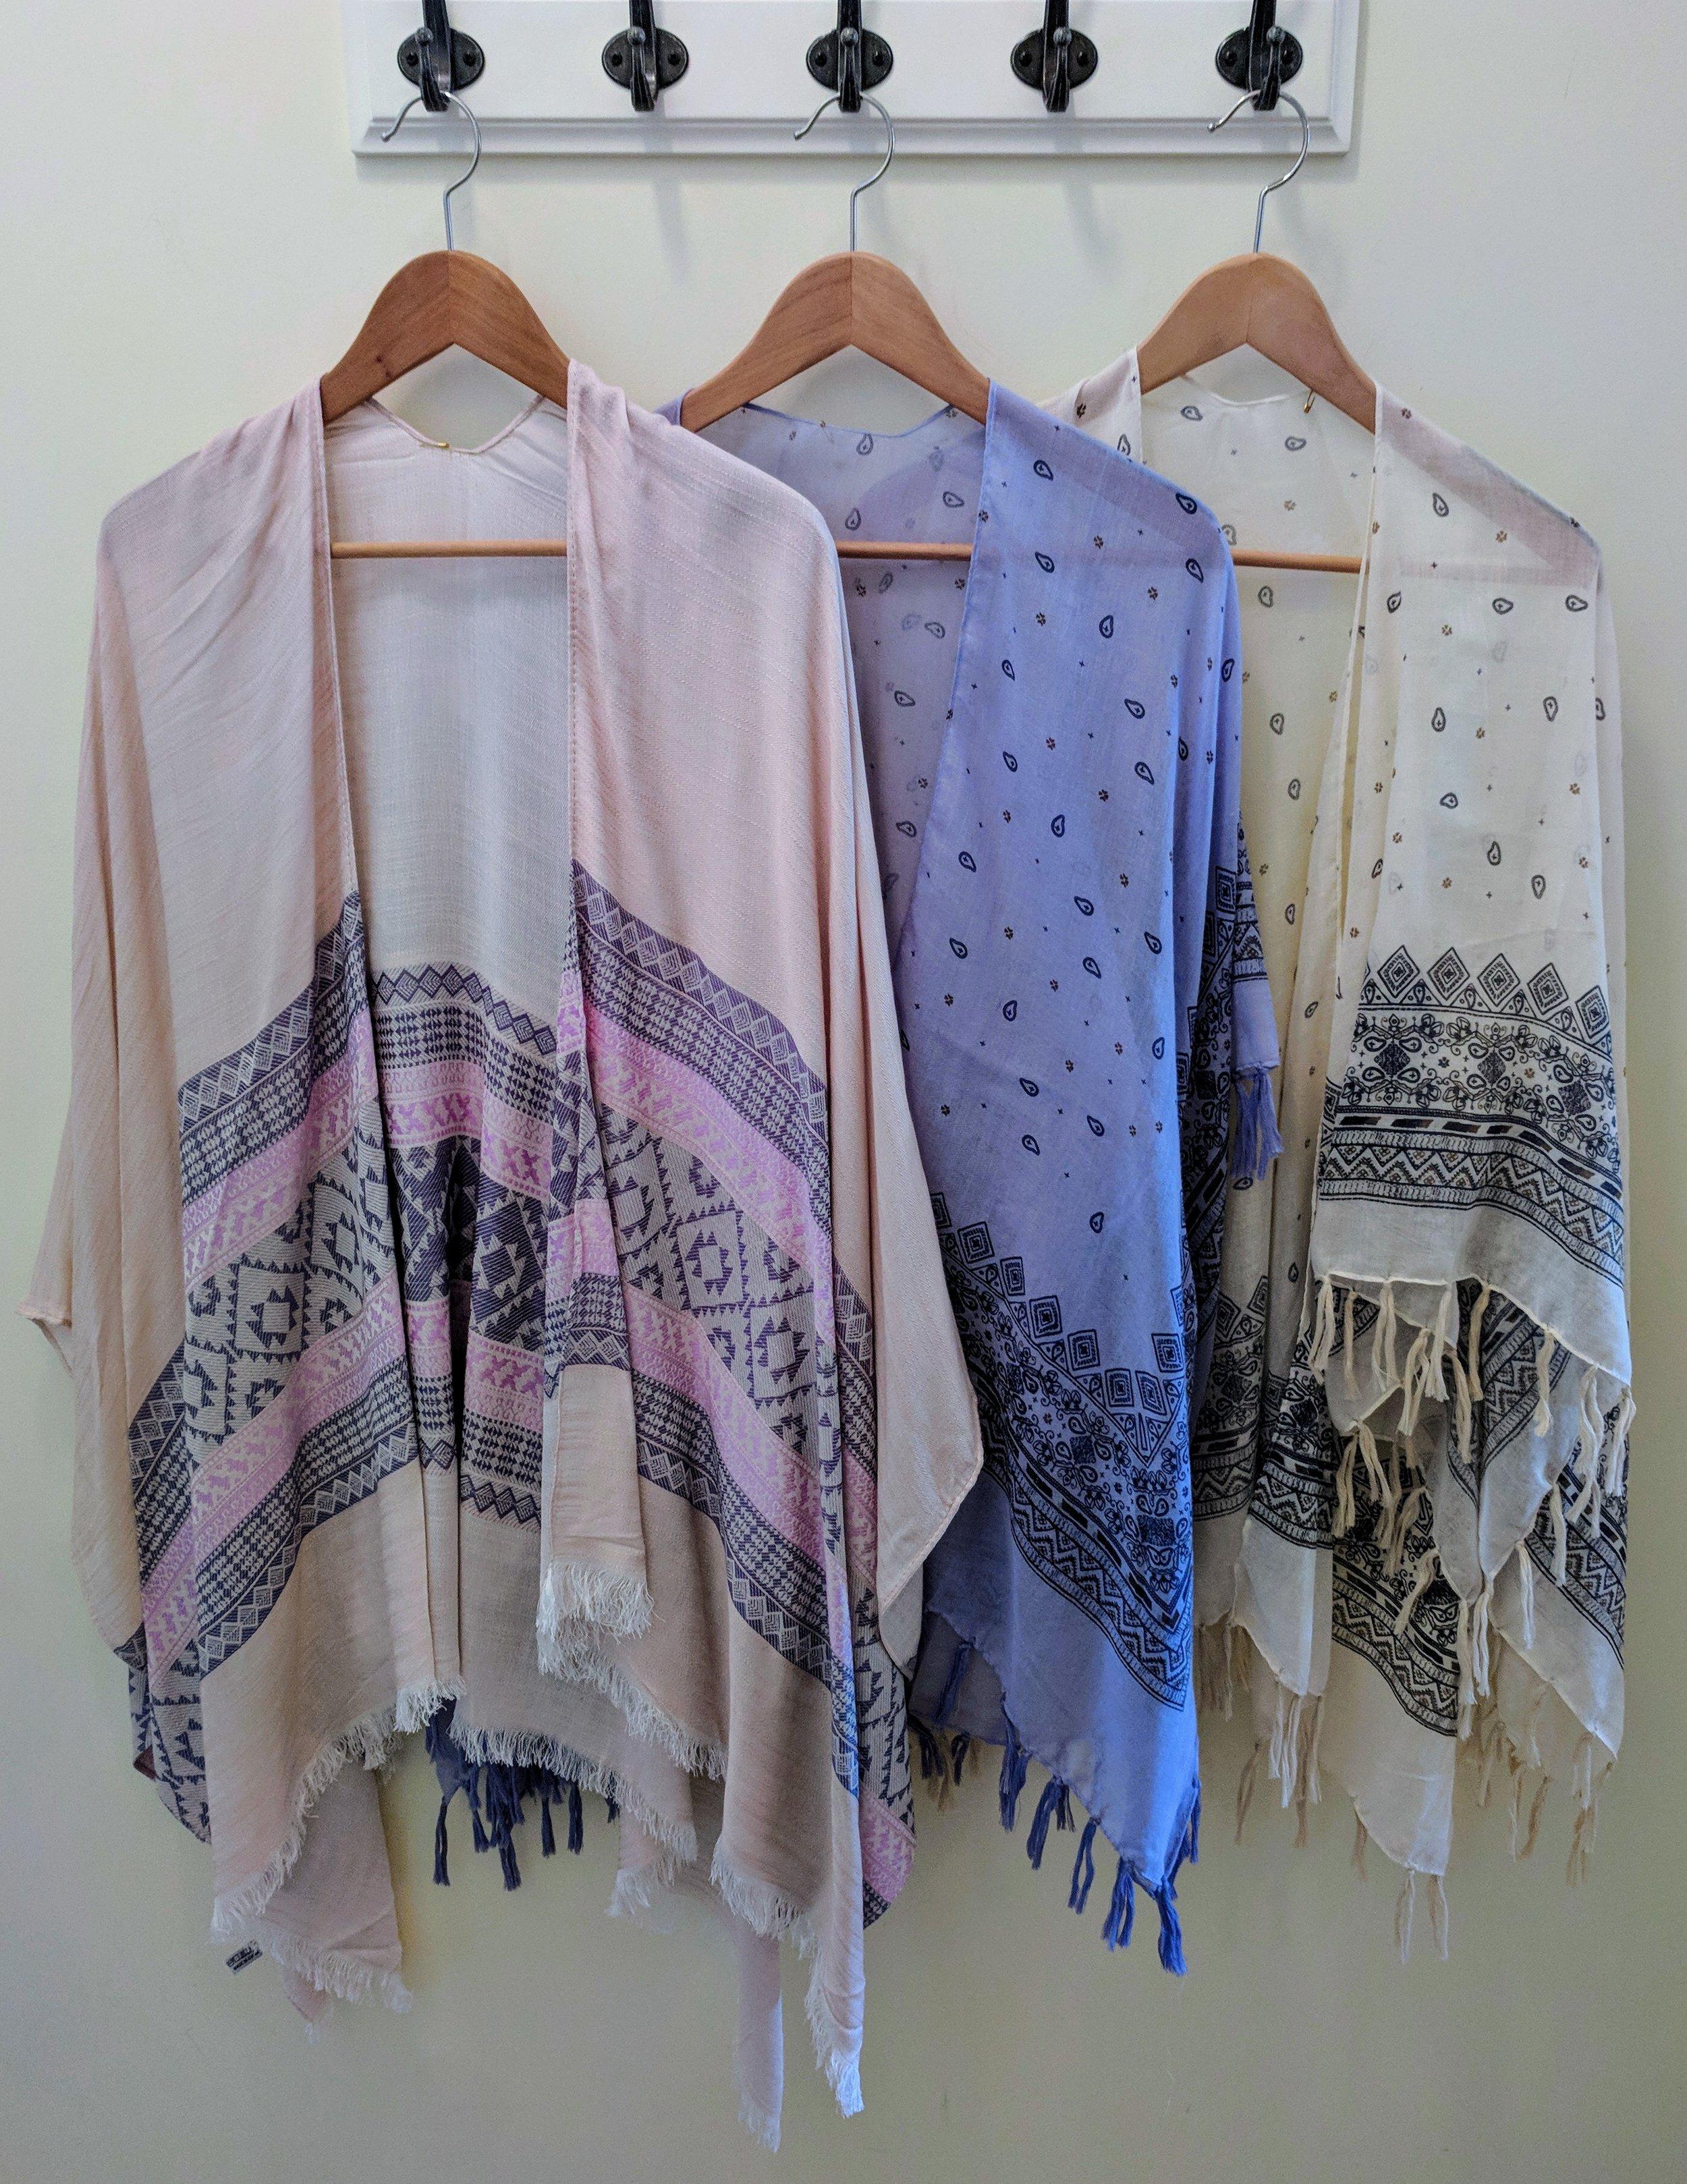 Lavender Woven Moroccan Kimono $24 Periwinkle and Ivory Kimono with tassels $21